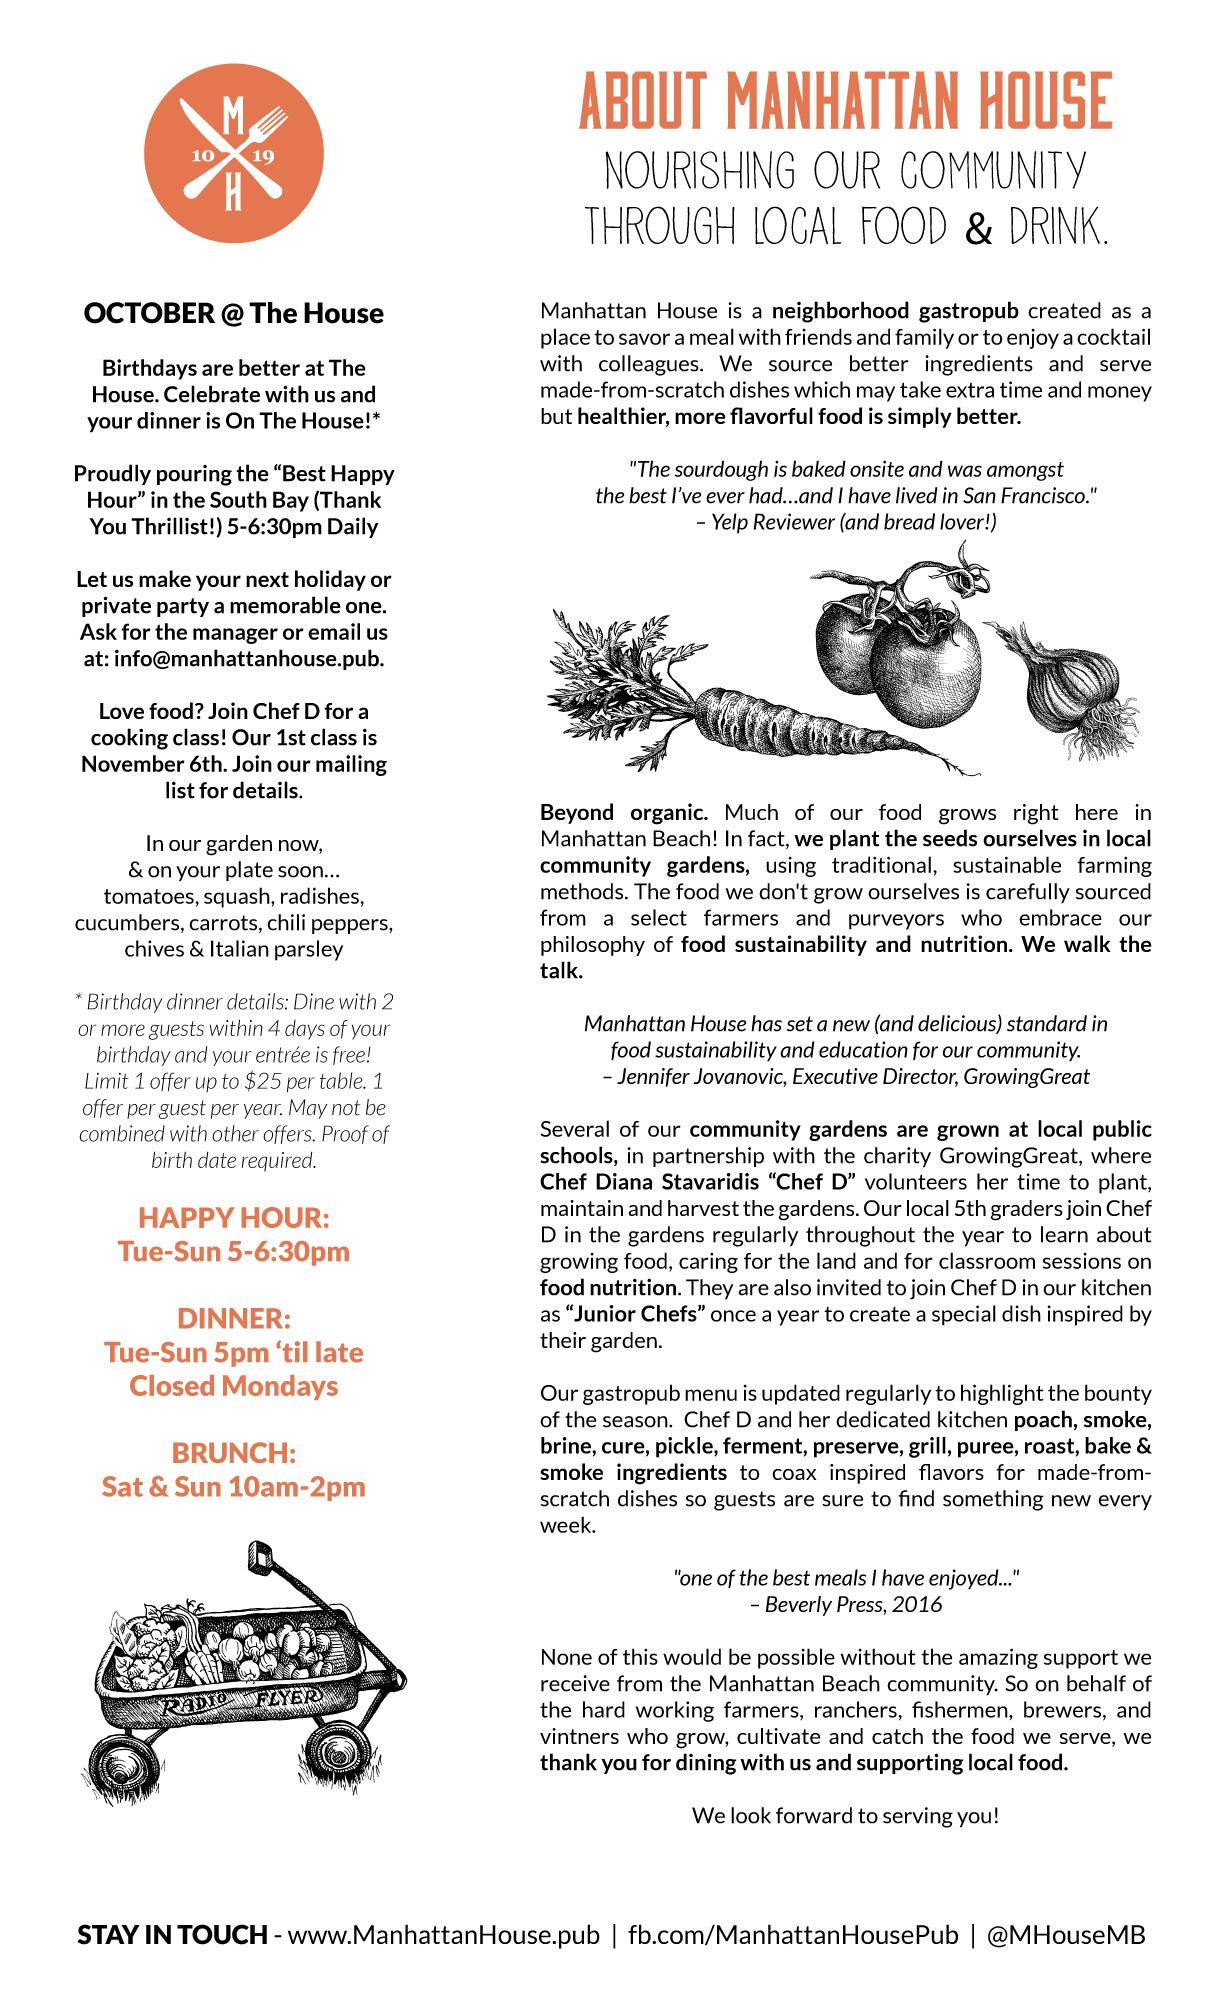 MHouse_DinnerMenu_Newsletter.jpg